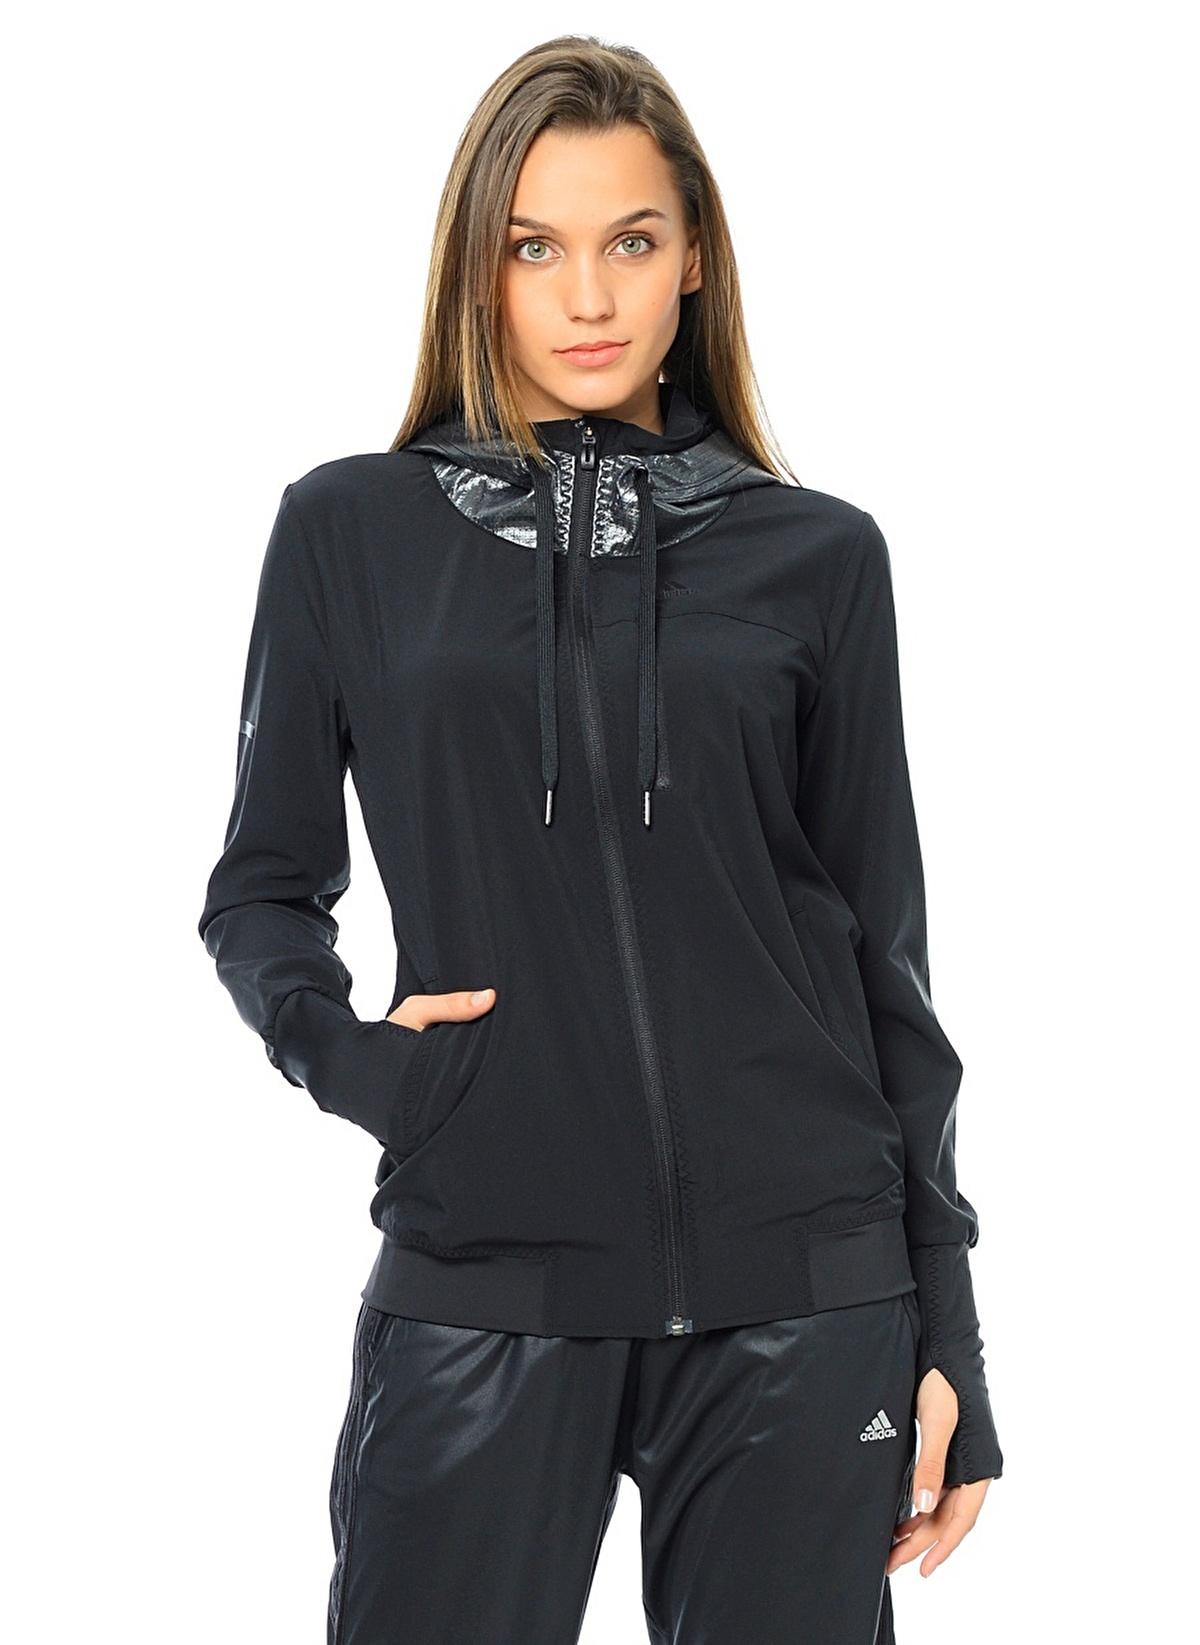 adidas - Kadın - Sweatshirt - M67098 Spo Wv Jacket,Black ...